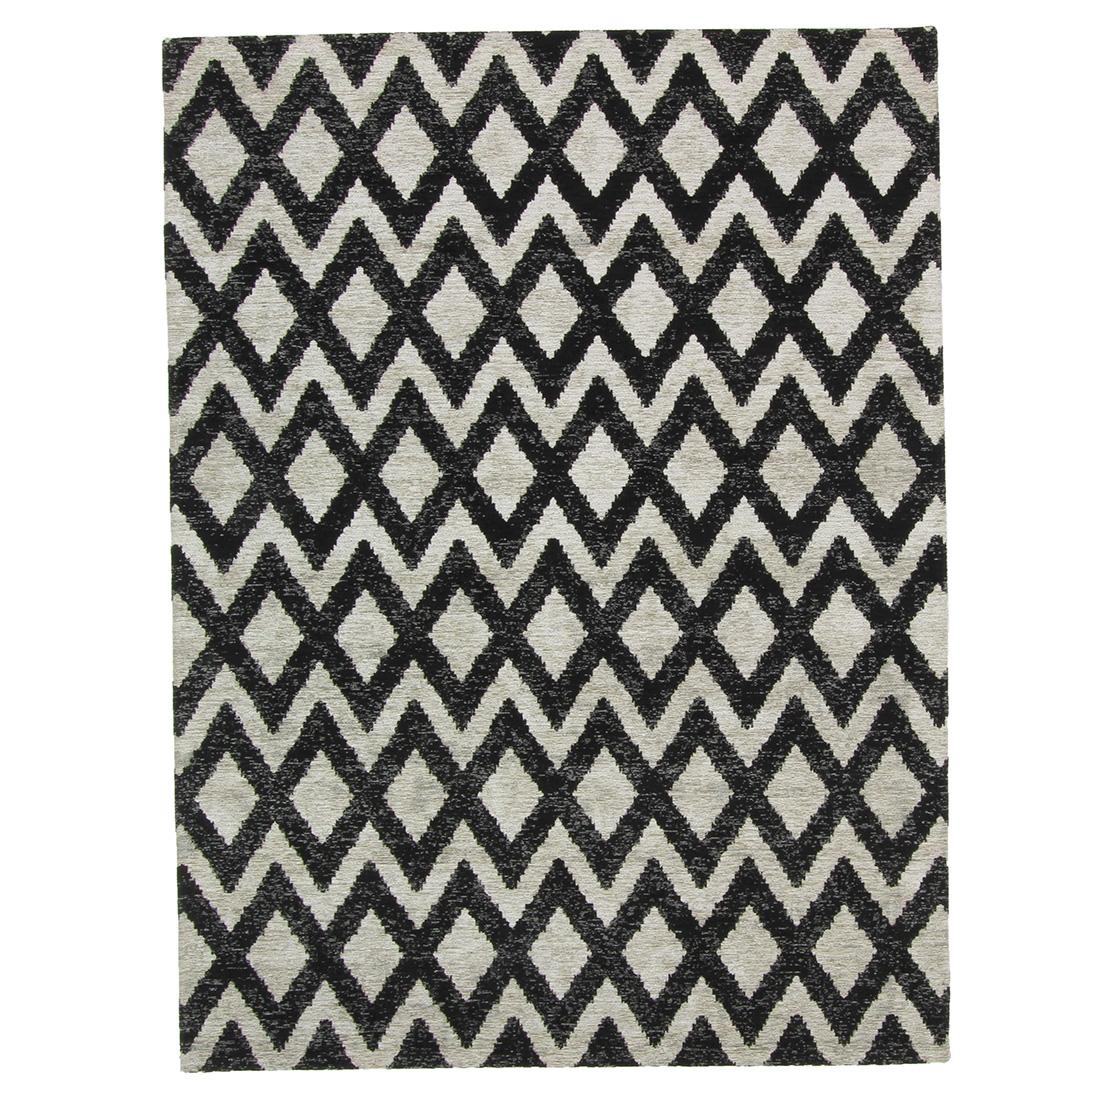 Vloerkleed Brinker Geometrics Rombu Beige Black | 170 x 230 cm